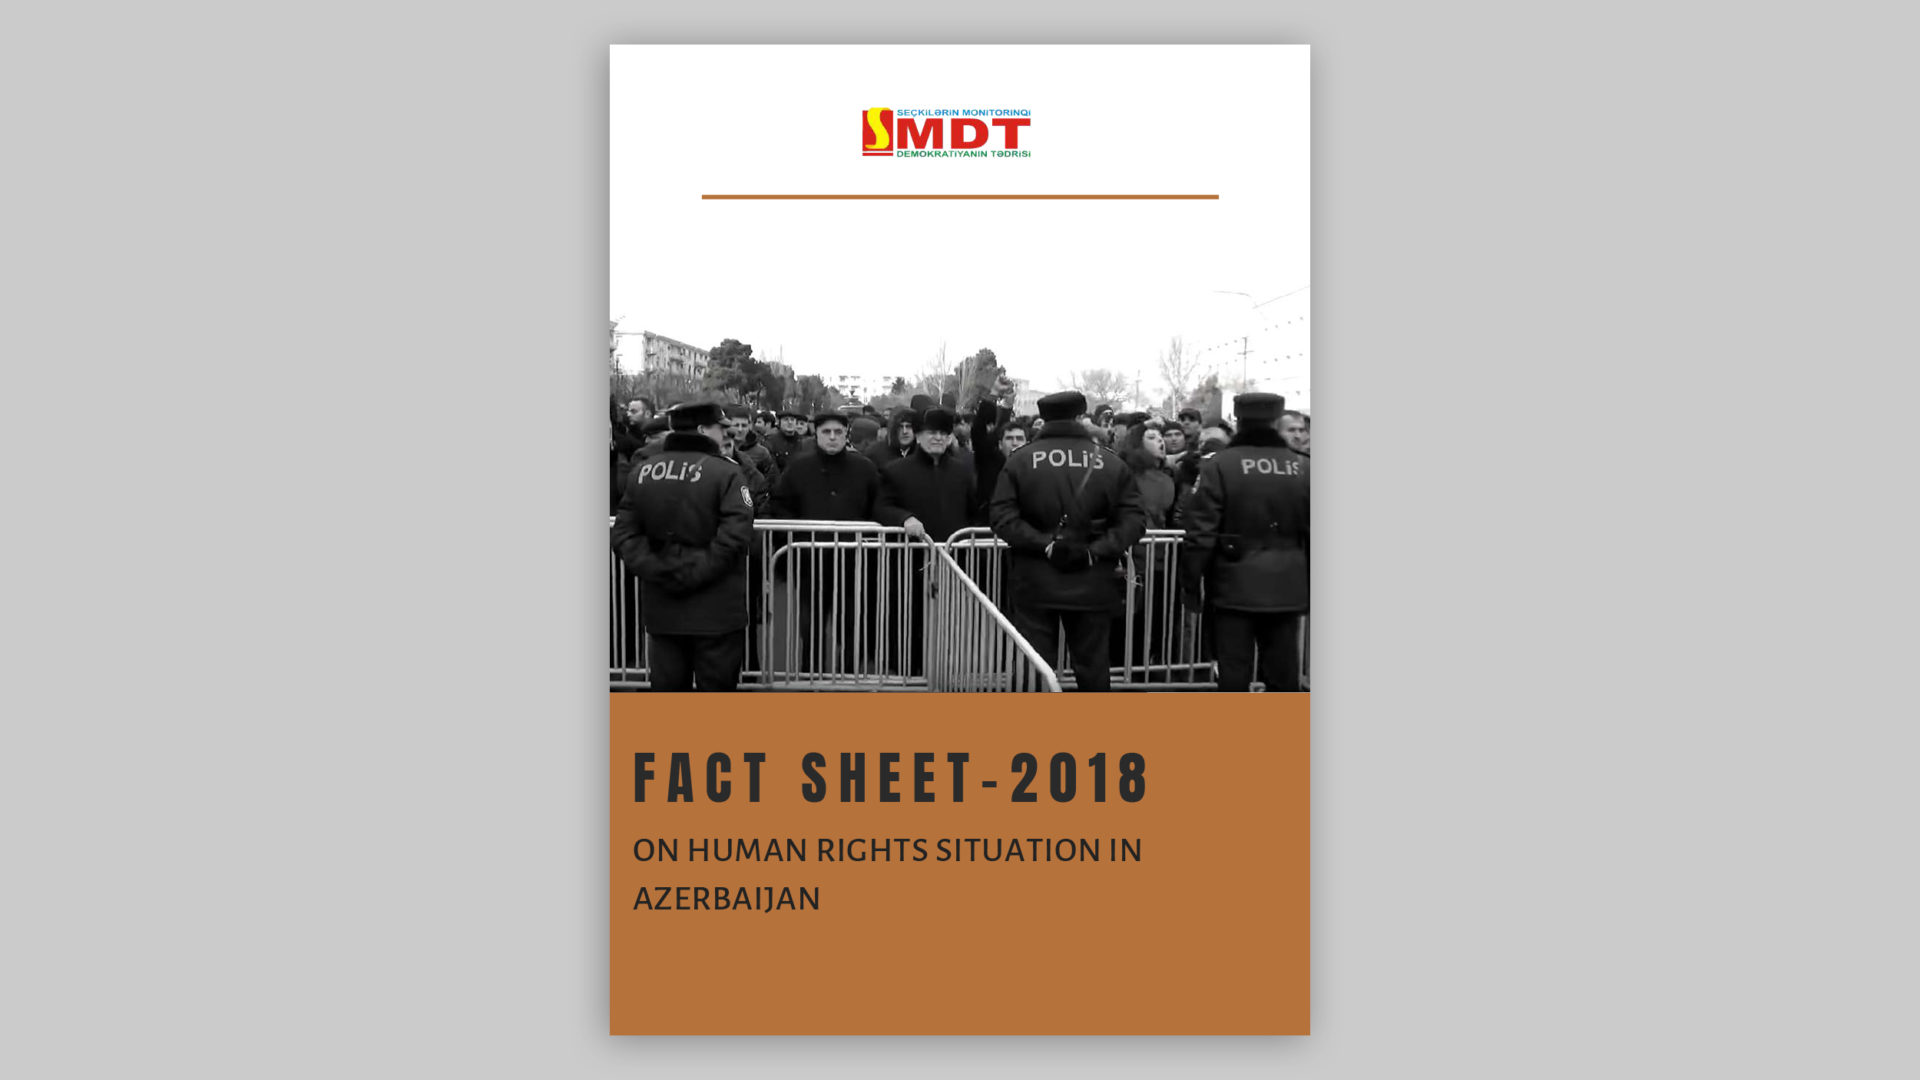 EMDS Fact Sheet 2018: Human Rights Situation in Azerbaijan